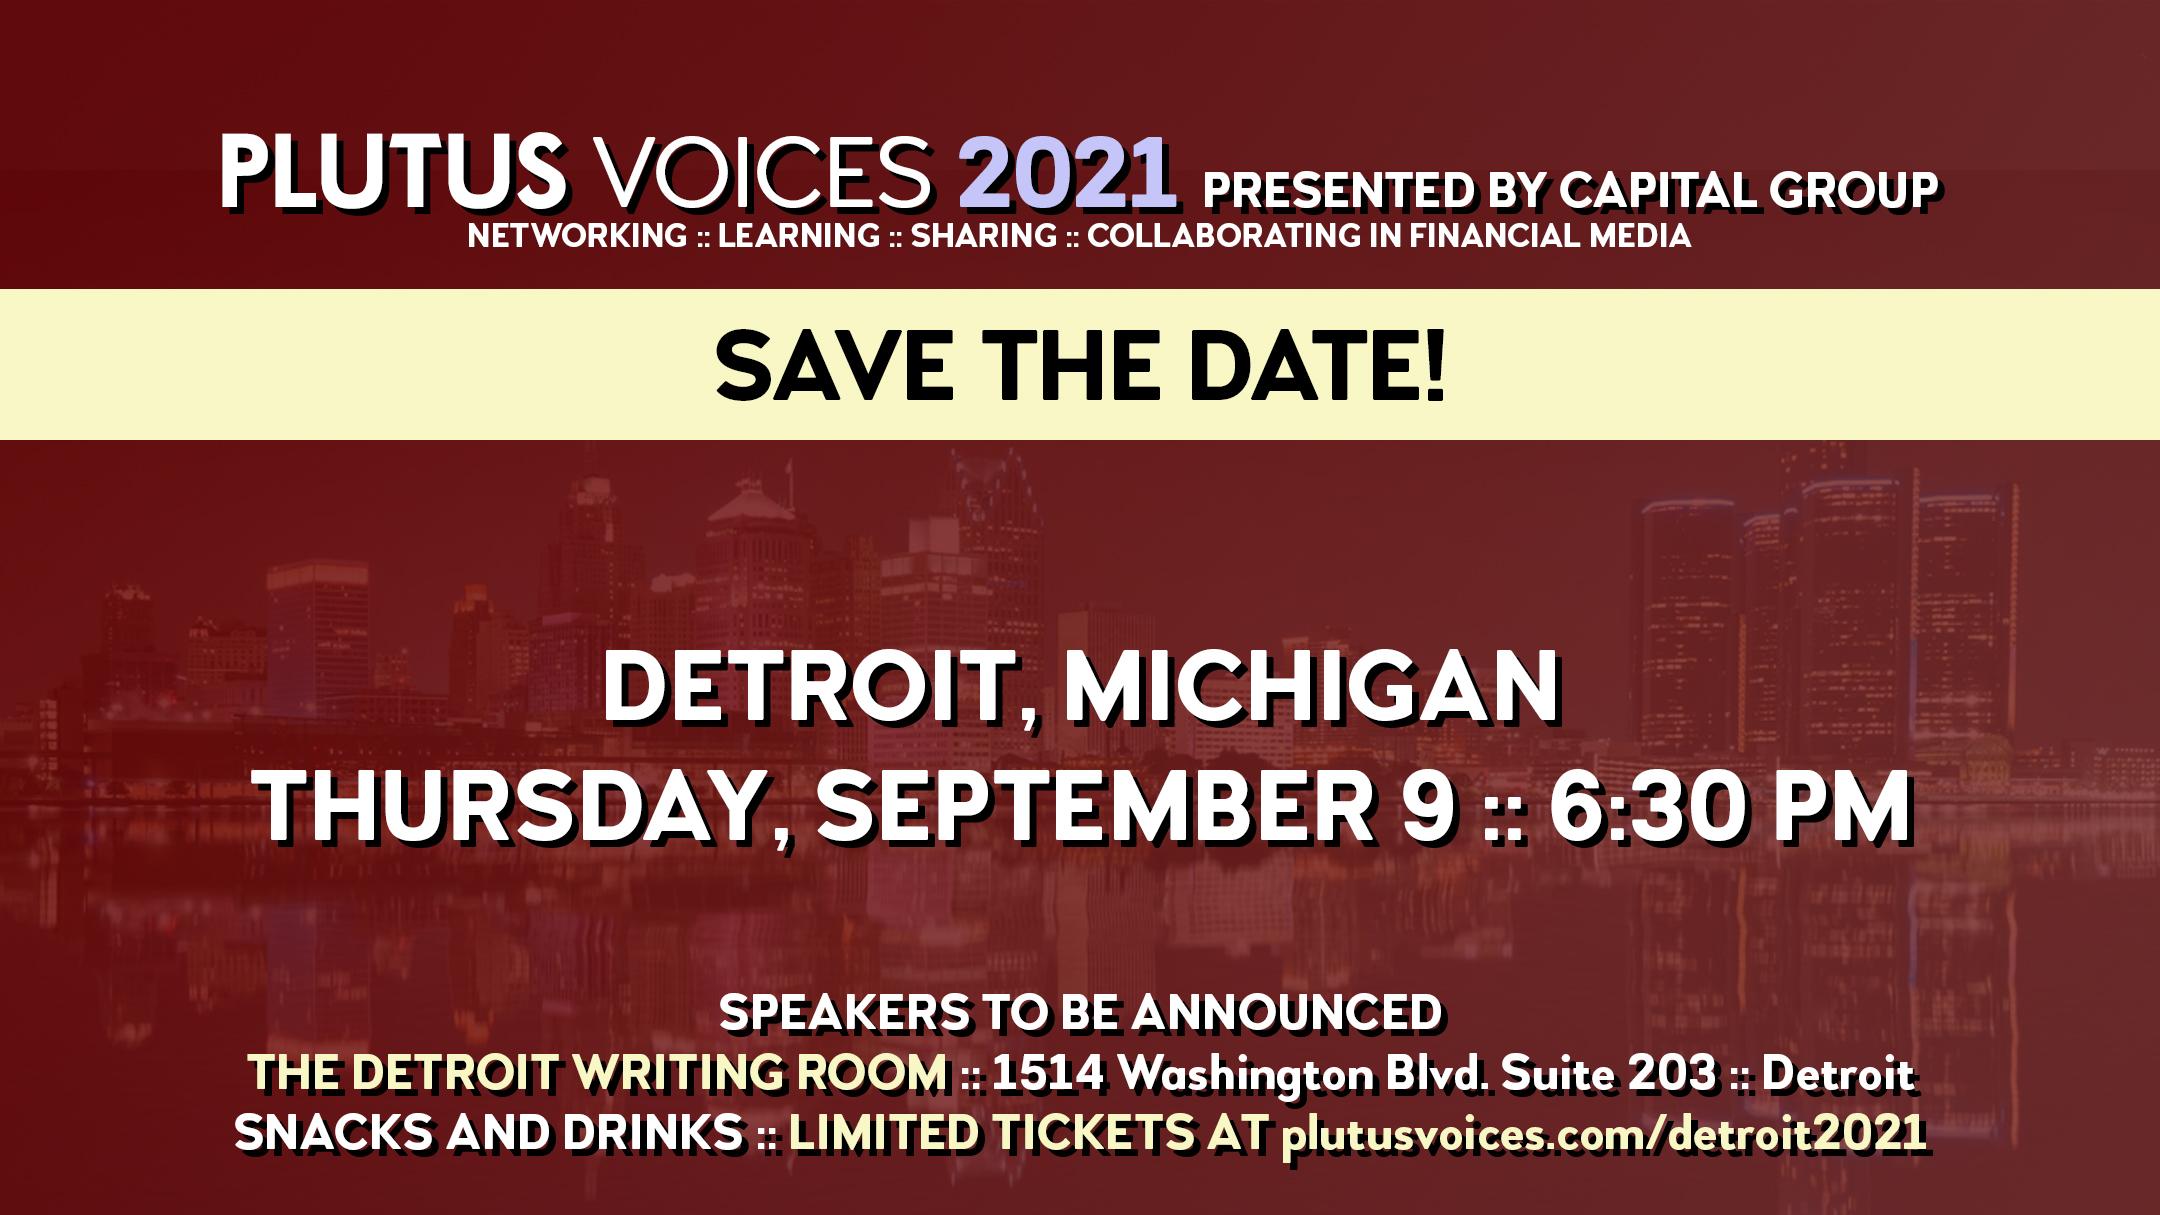 Plutus Voices 2021